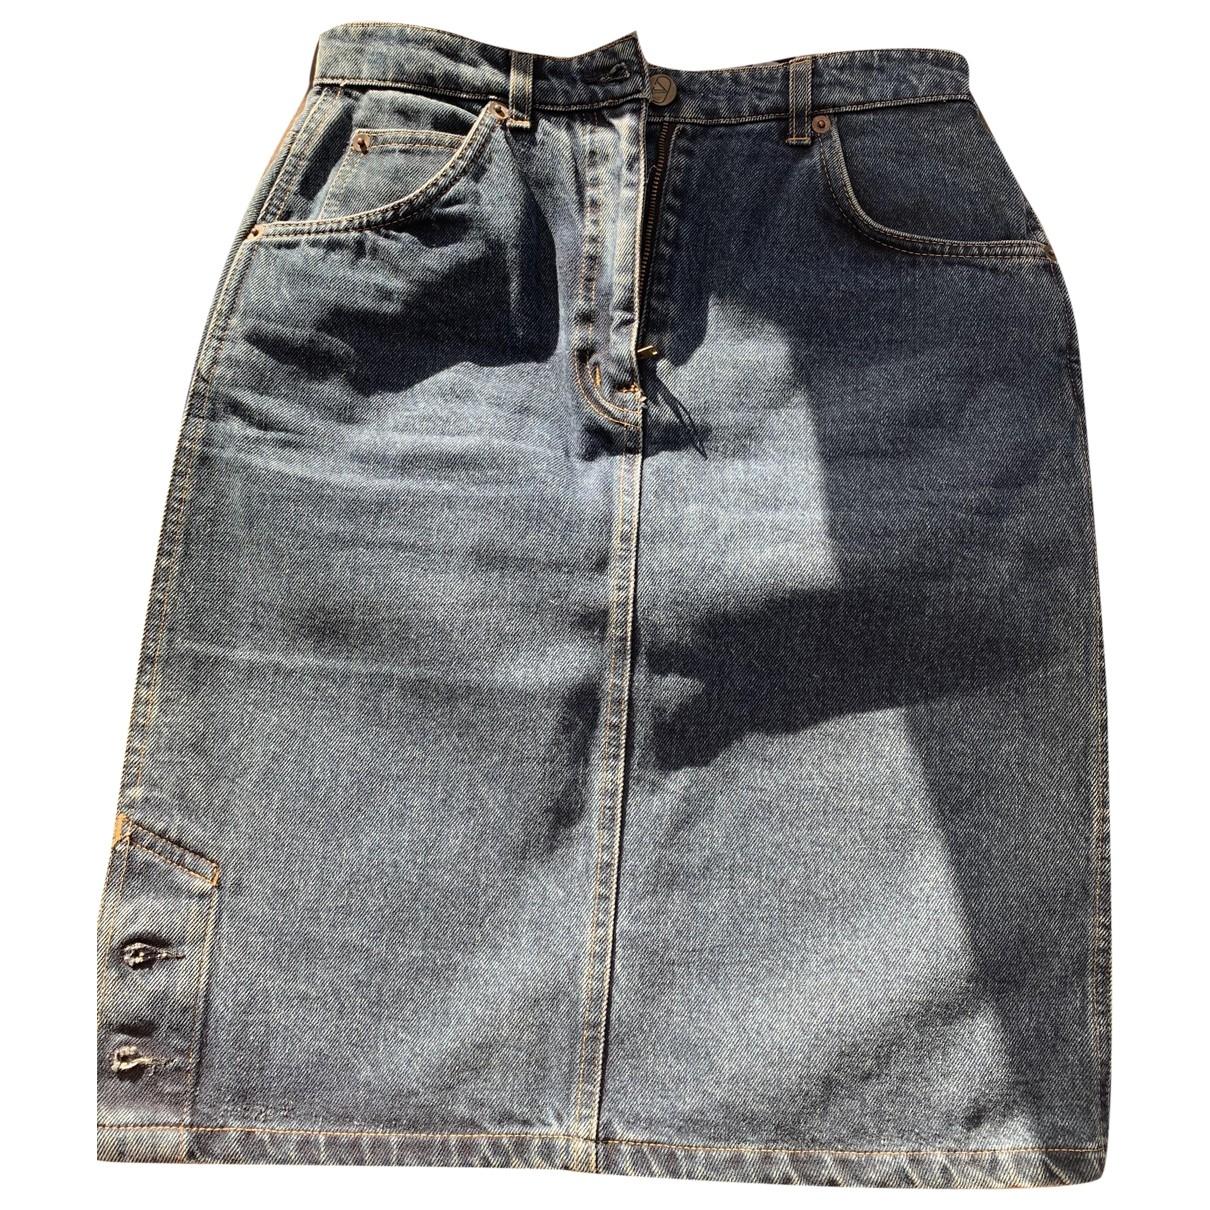 Valentino Garavani \N Denim - Jeans skirt for Women XS International